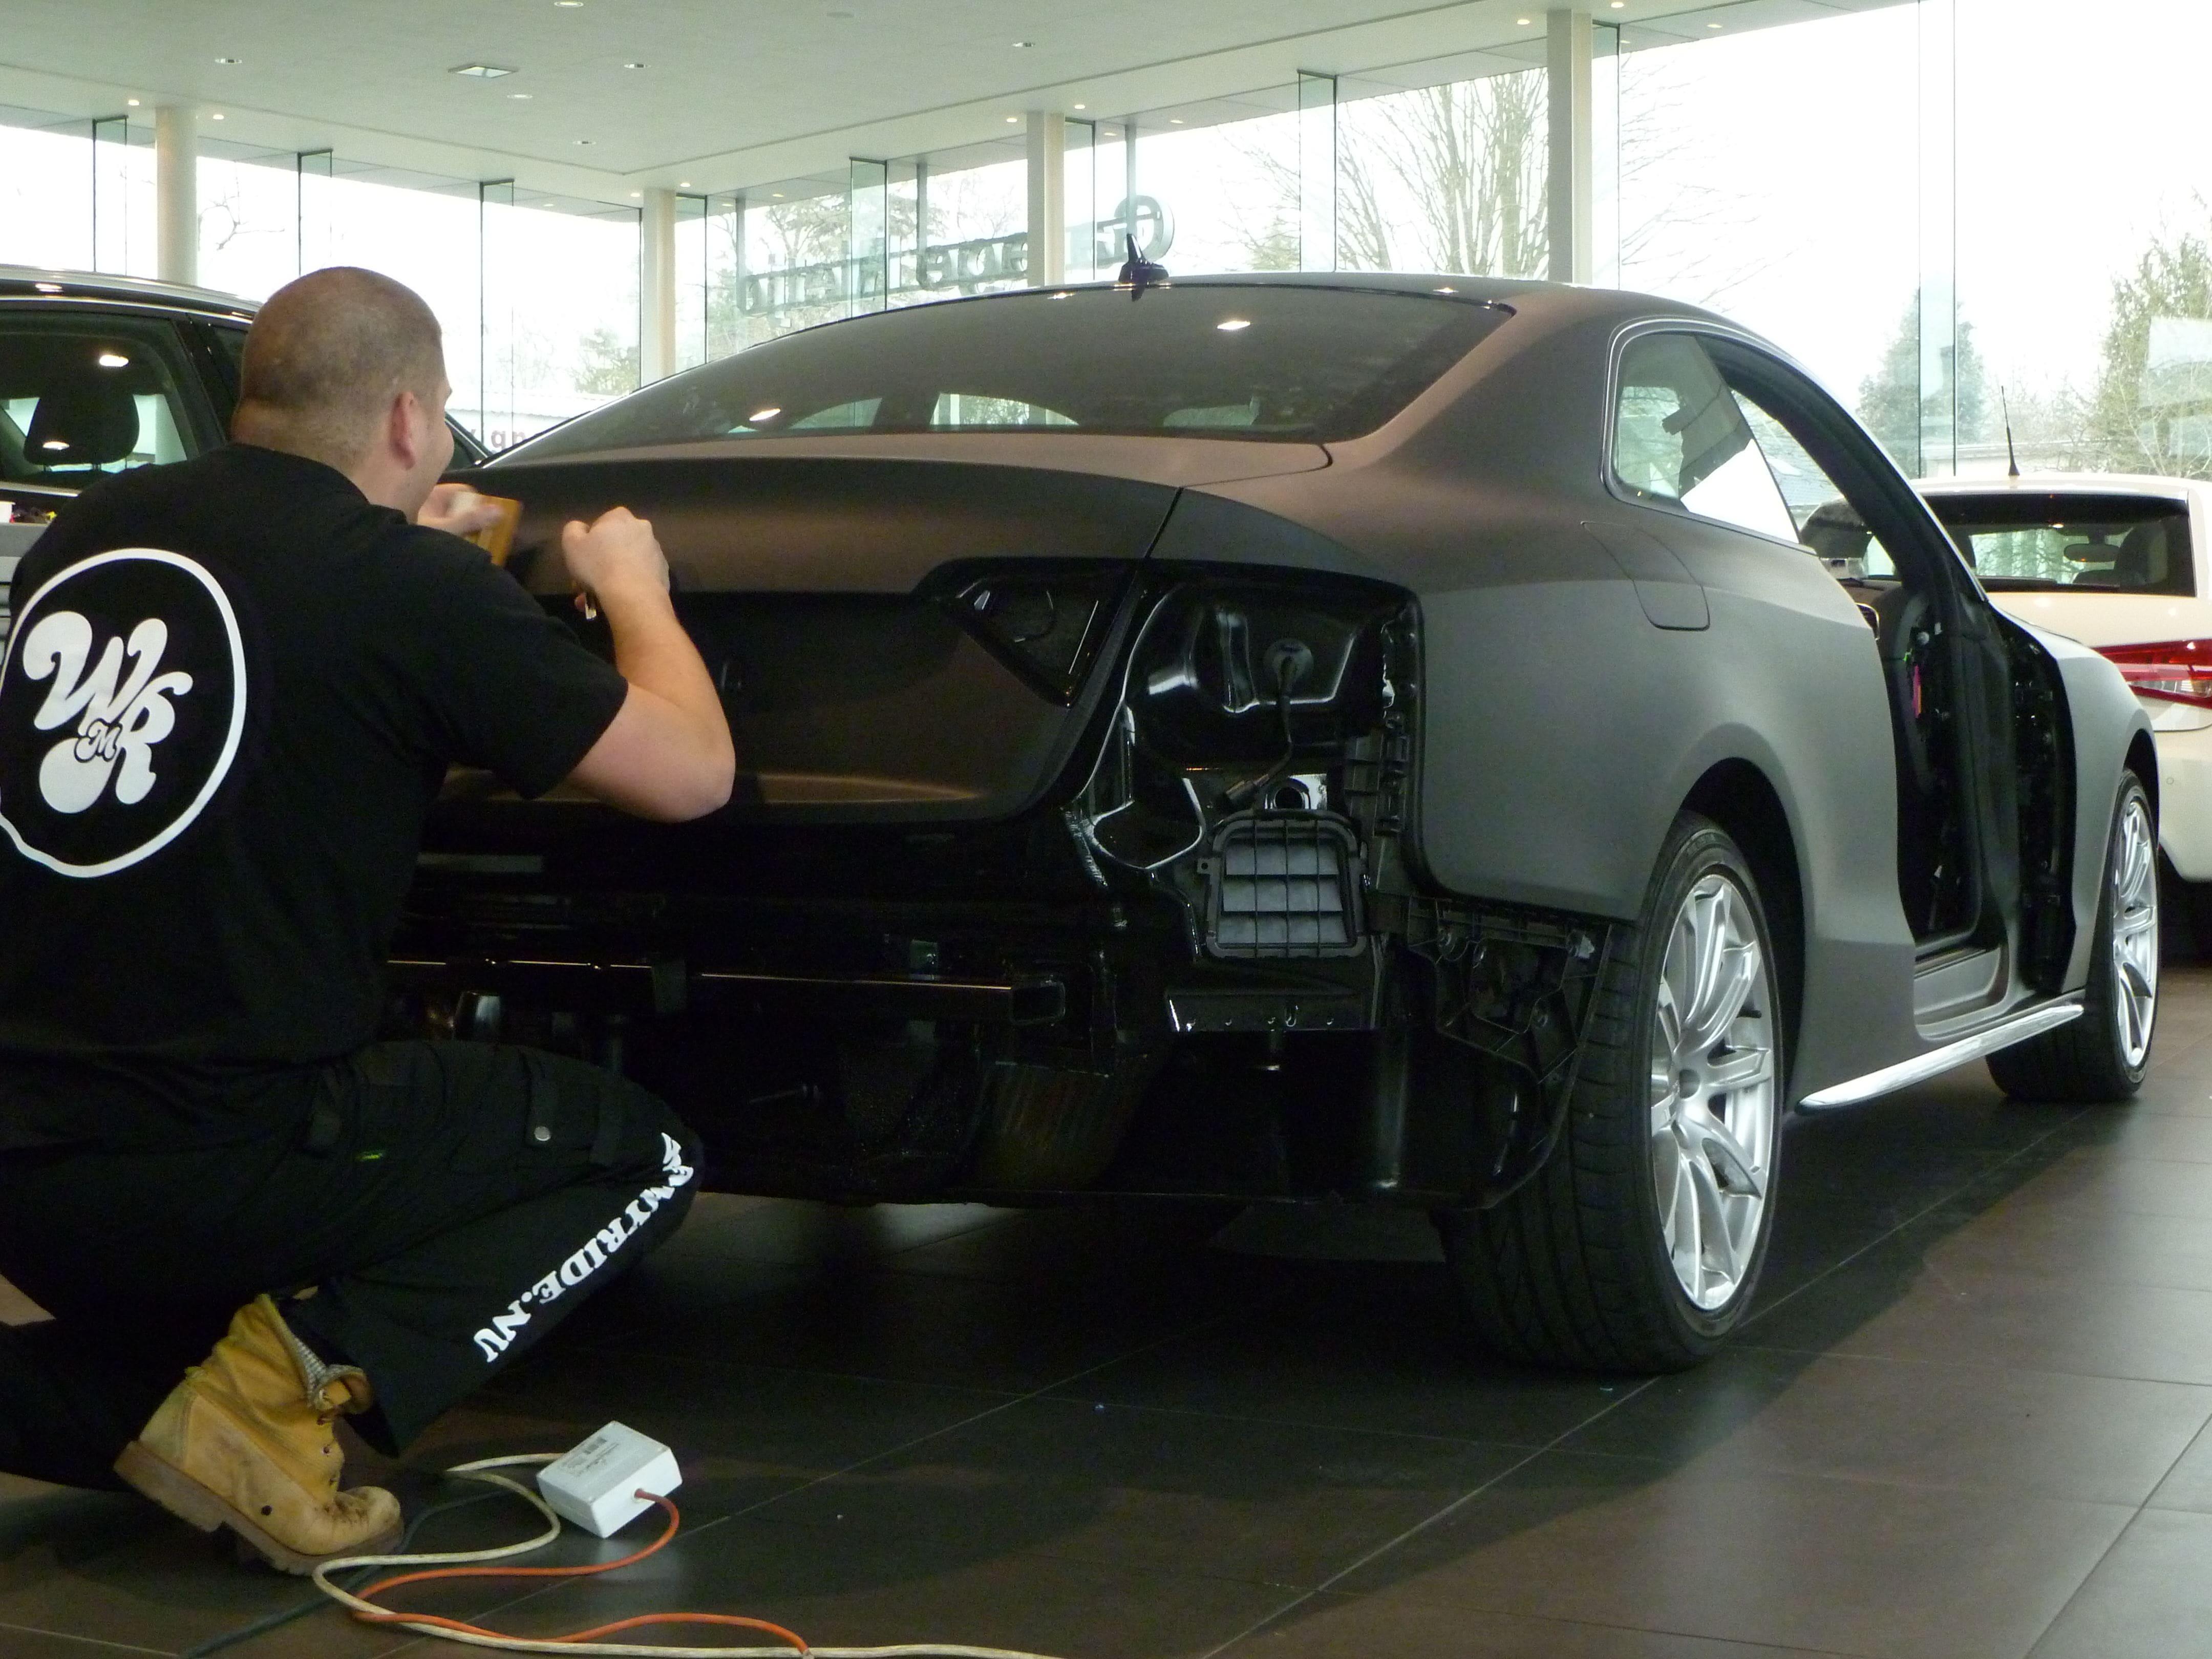 Audi A5 Coupe met Mat Zwarte Wrap, Carwrapping door Wrapmyride.nu Foto-nr:4623, ©2021